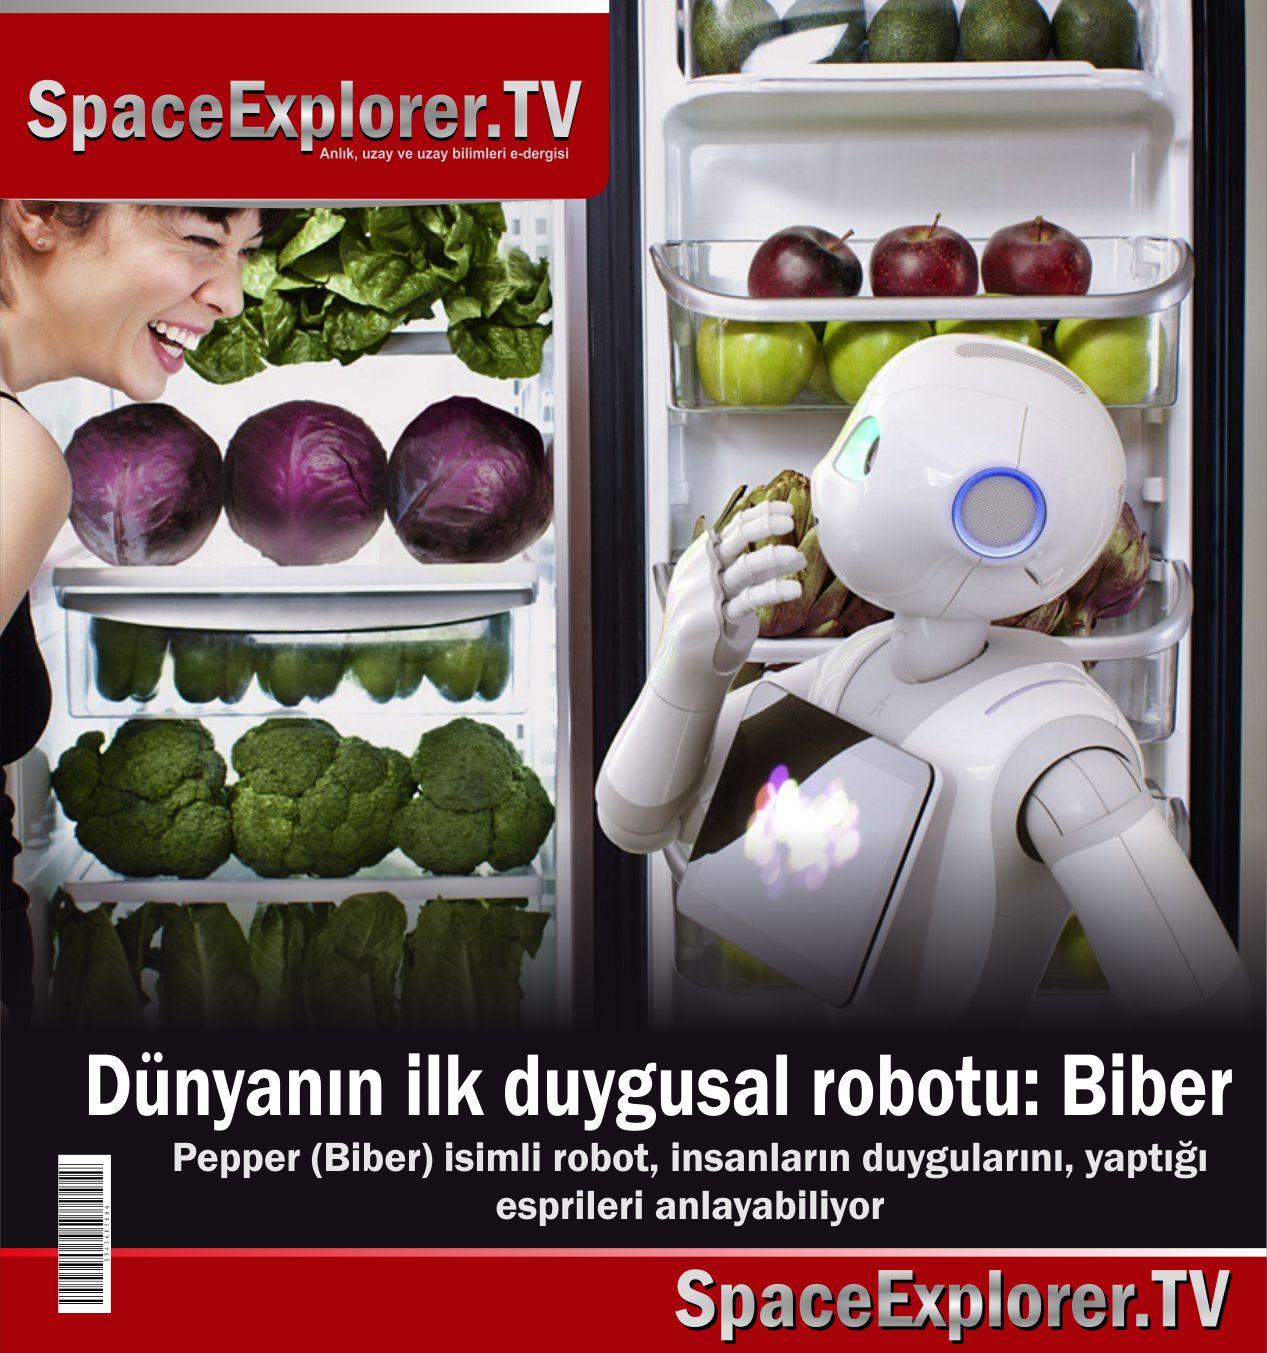 Robot teknolojisi, insansı robotlar, Zihin kontrolü, Yapay zeka, Japonya, Robot Biber (Pepper), Videolar,